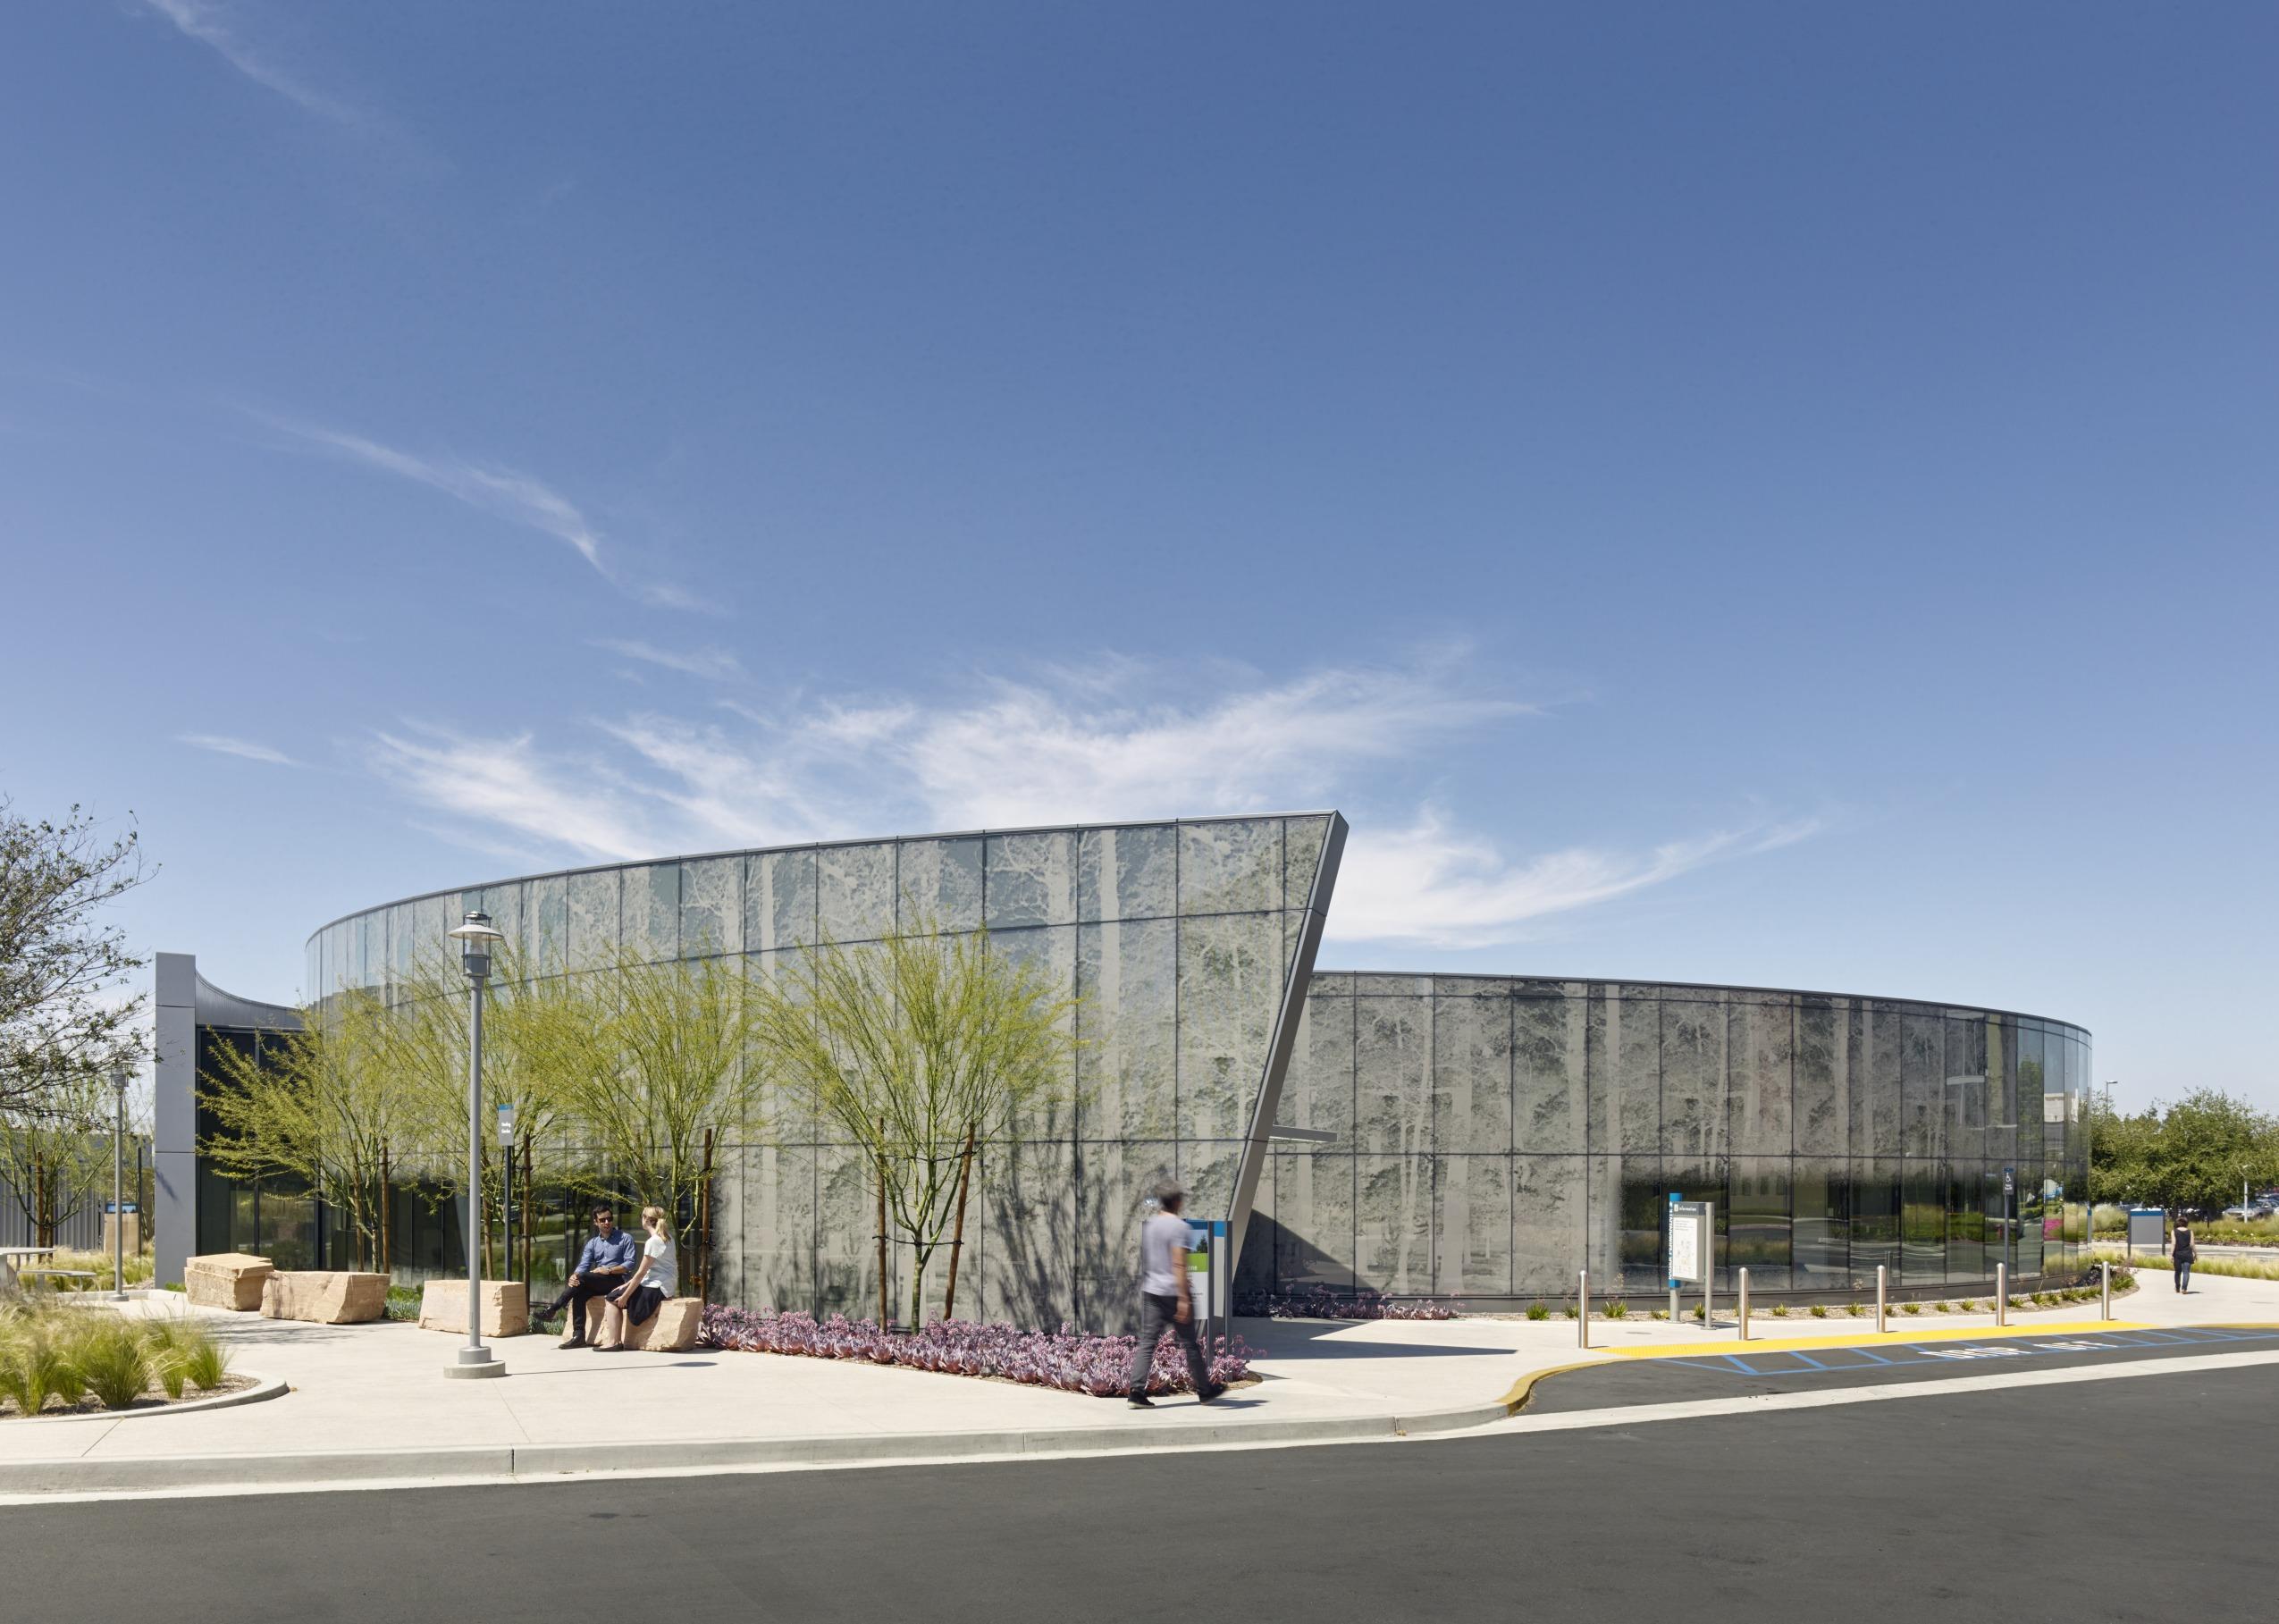 Kaiser Permanente Radiation Oncology Center Architect